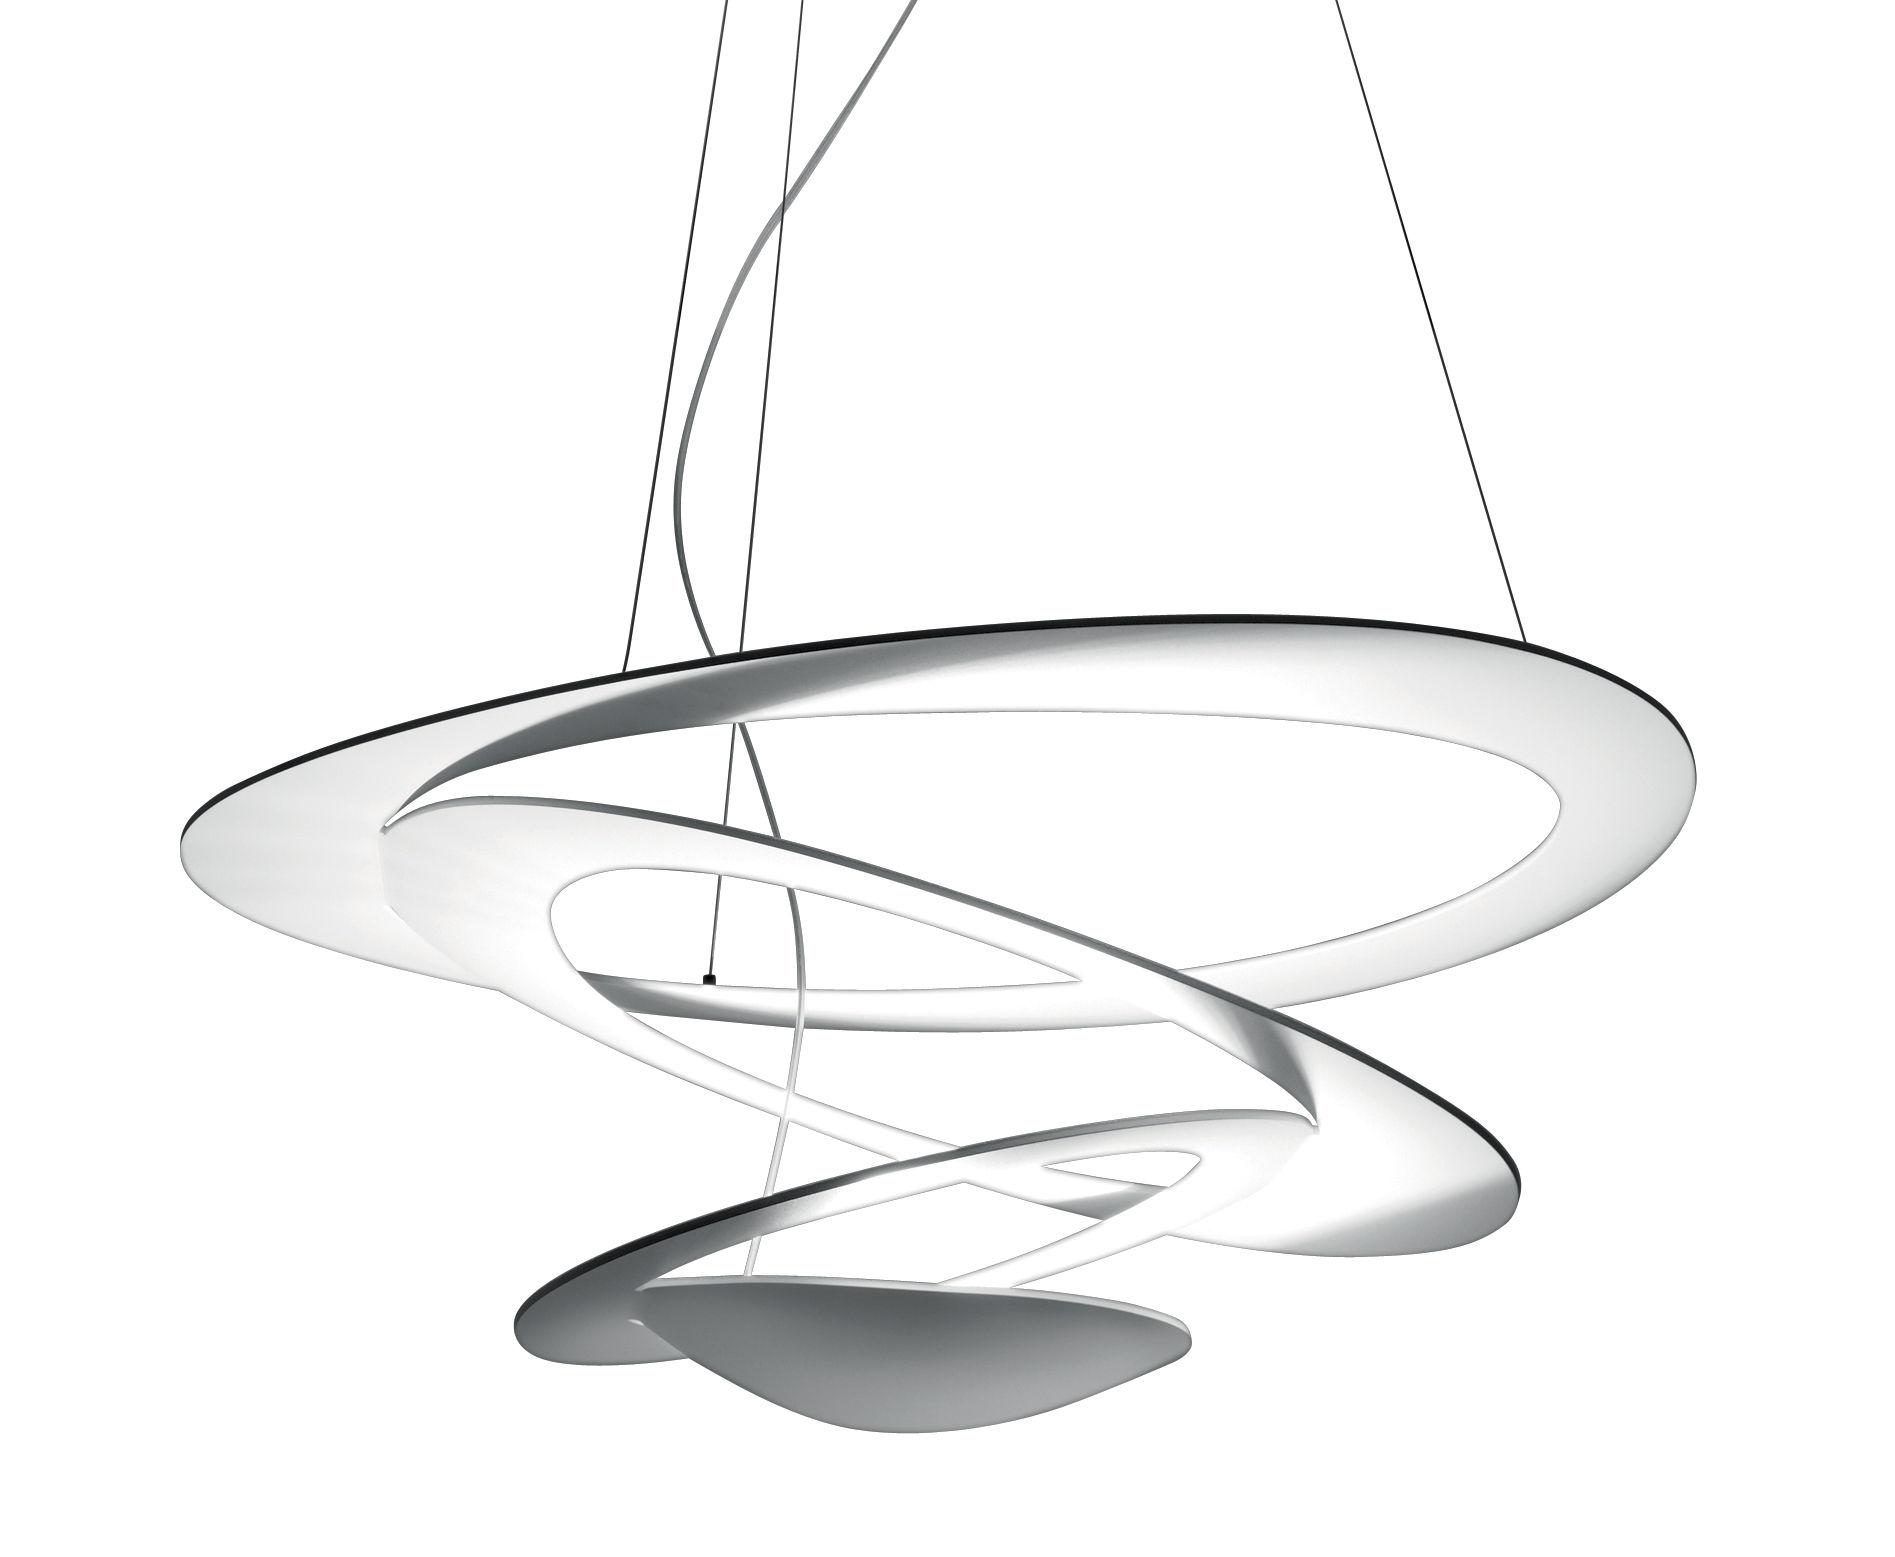 Lighting - Pendant Lighting - Pirce Mini LED Pendant - Ø 69 cm by Artemide - White - Varnished aluminium